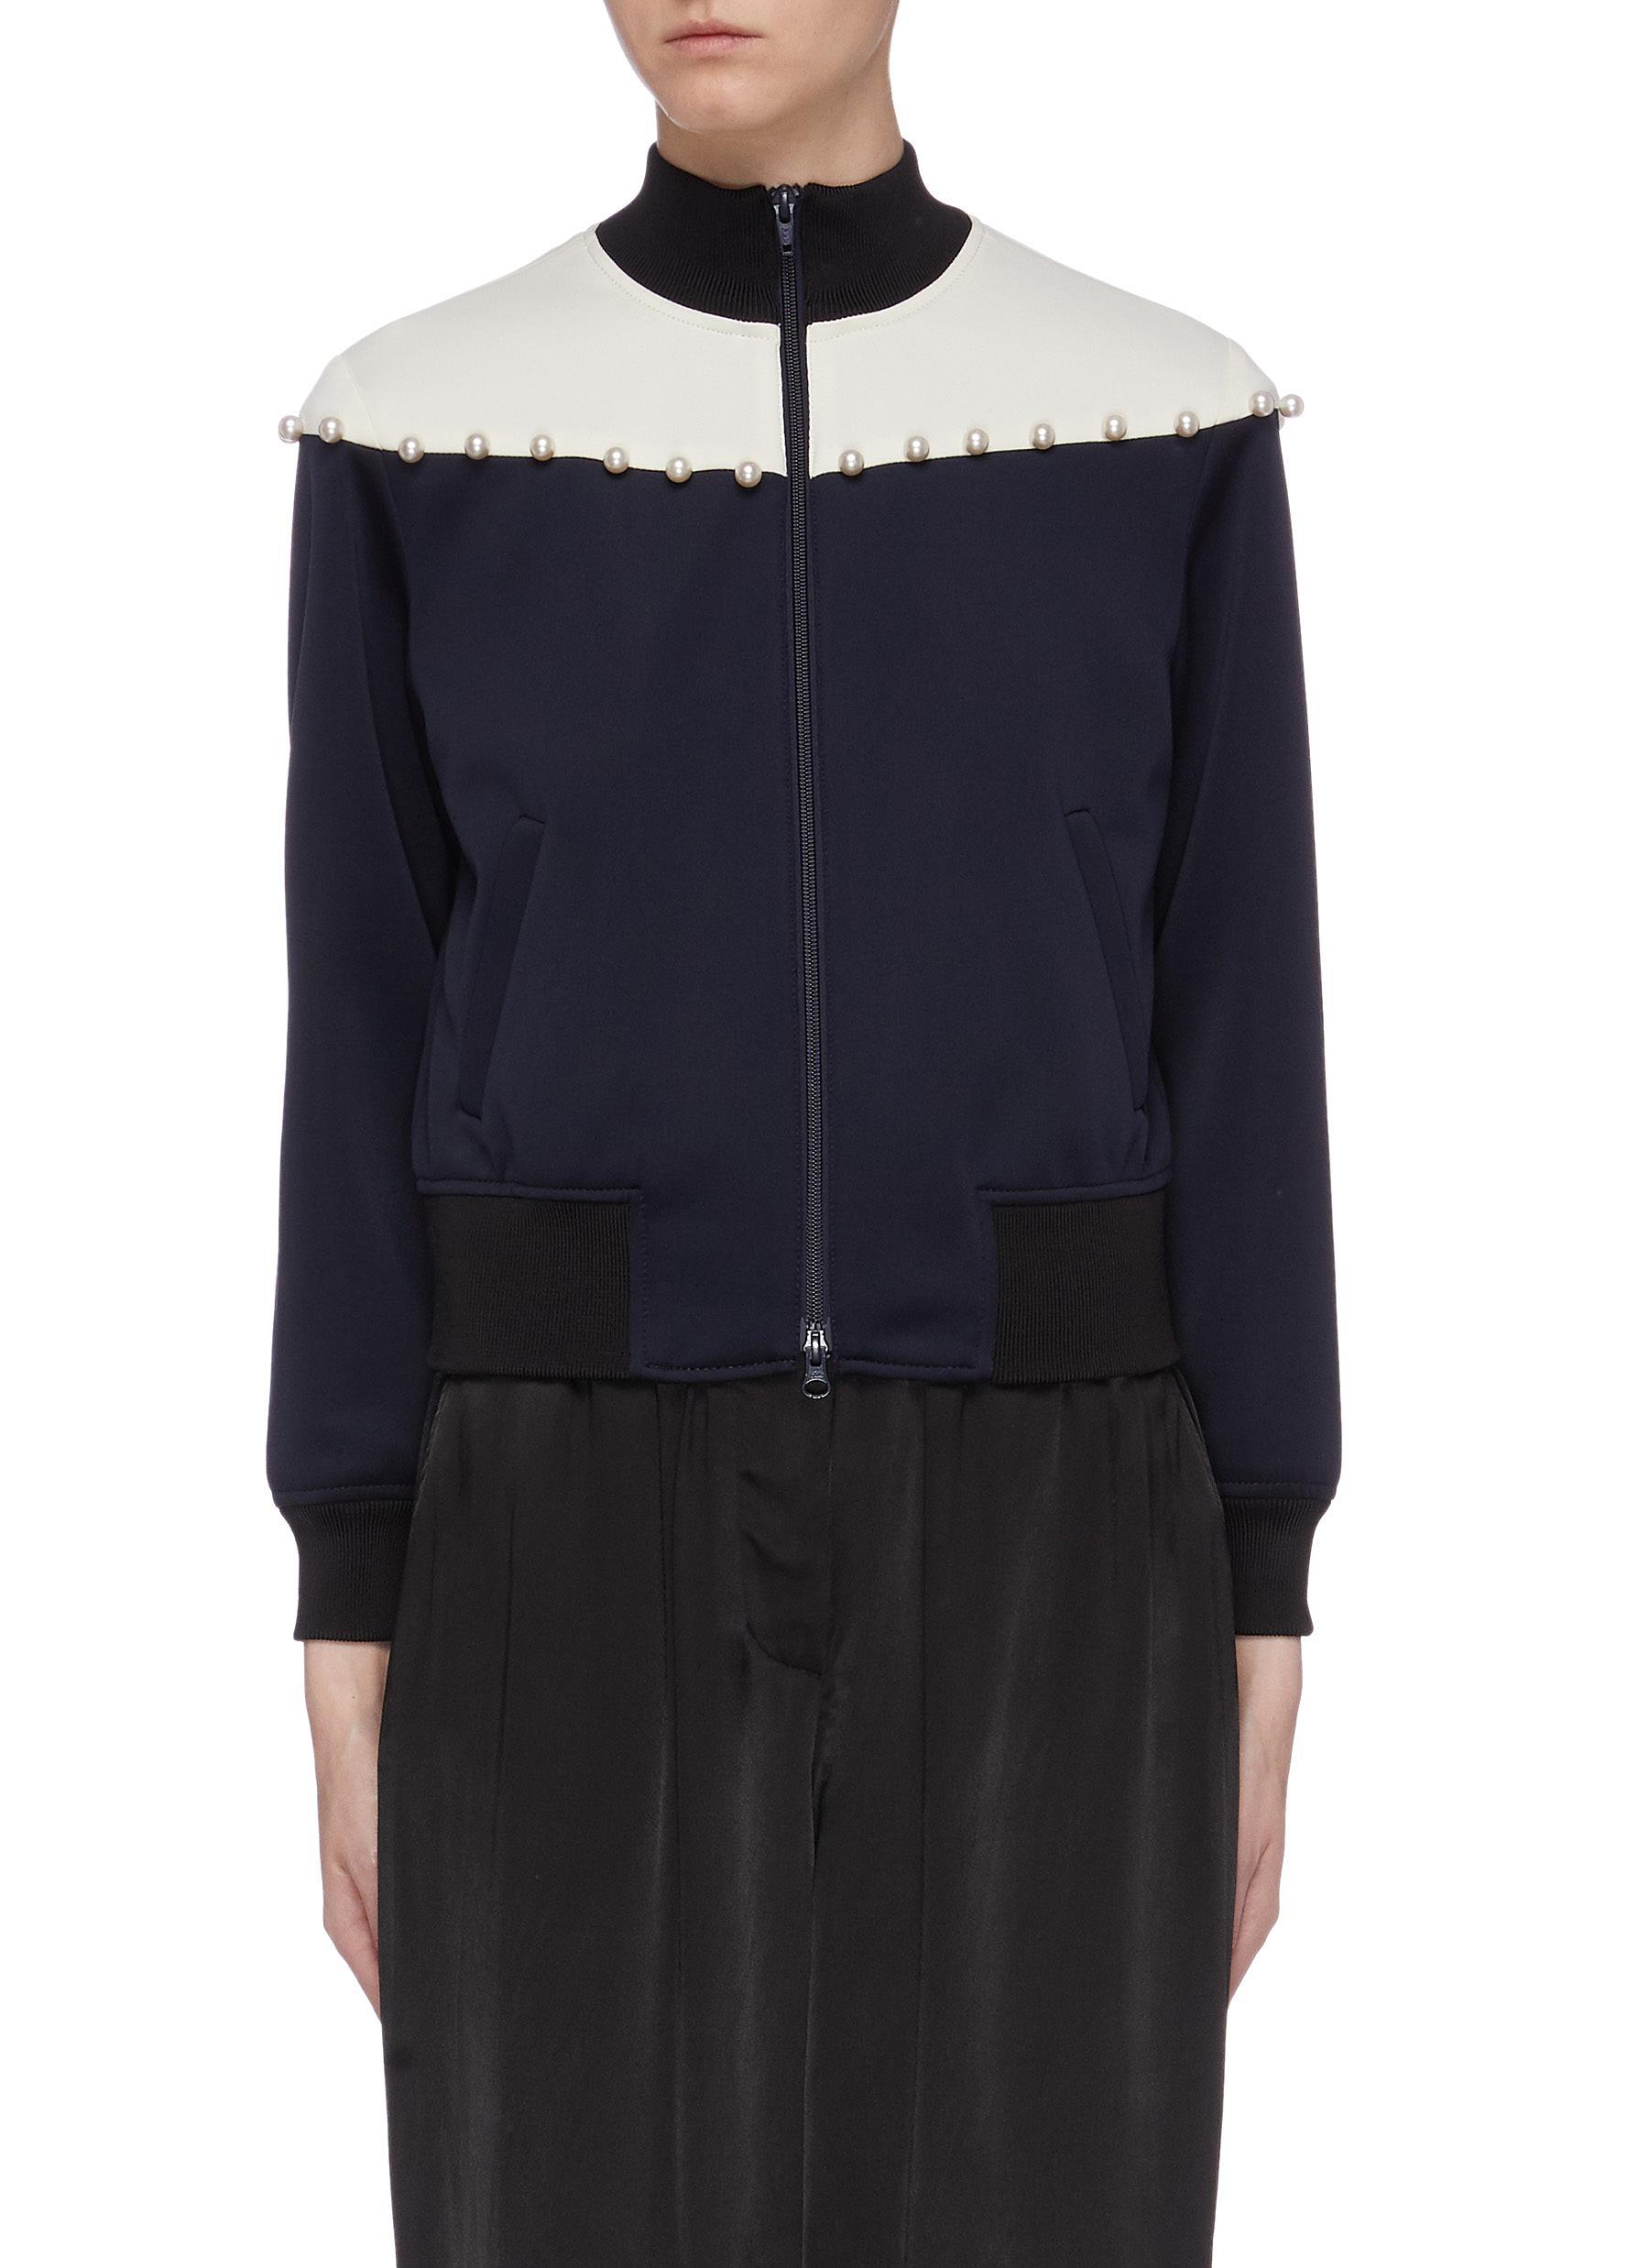 Faux pearl colourblock yoke track jacket by 3.1 Phillip Lim